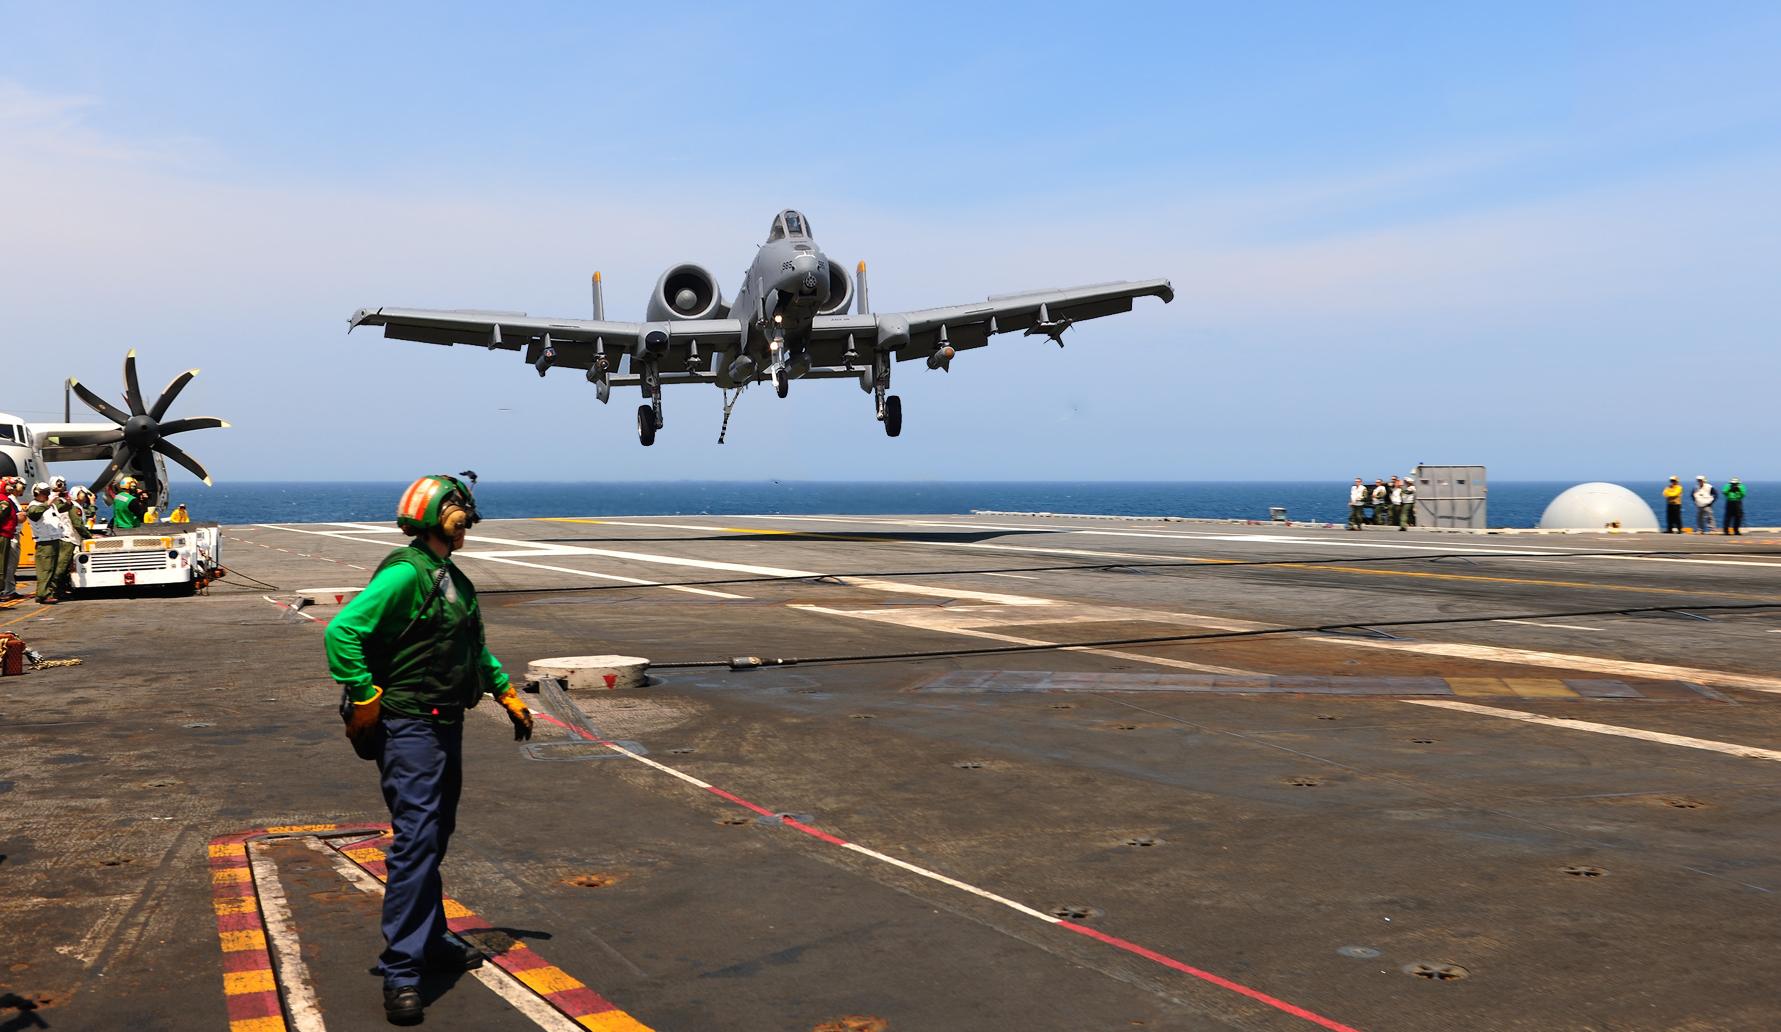 A-10 Warthog Carrier Landing